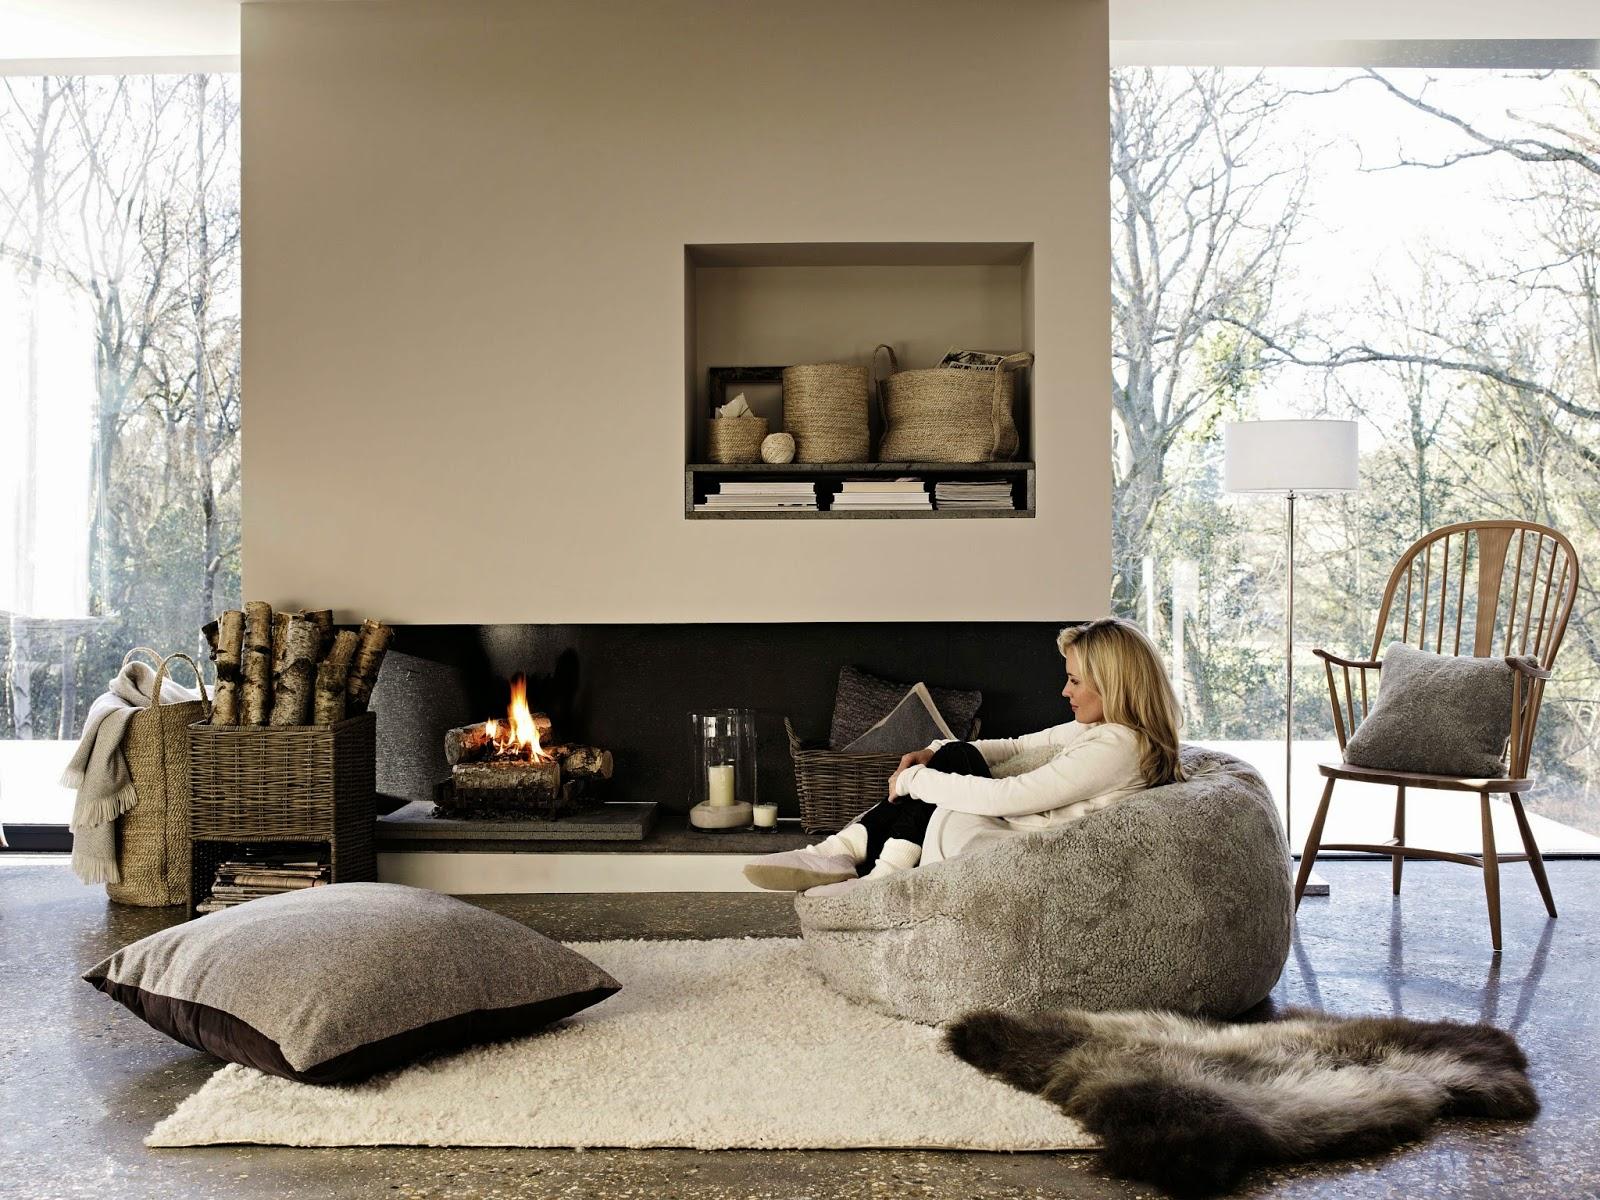 Home Interior Design Online Games Winter Decorations Interior Design Living Room Interior